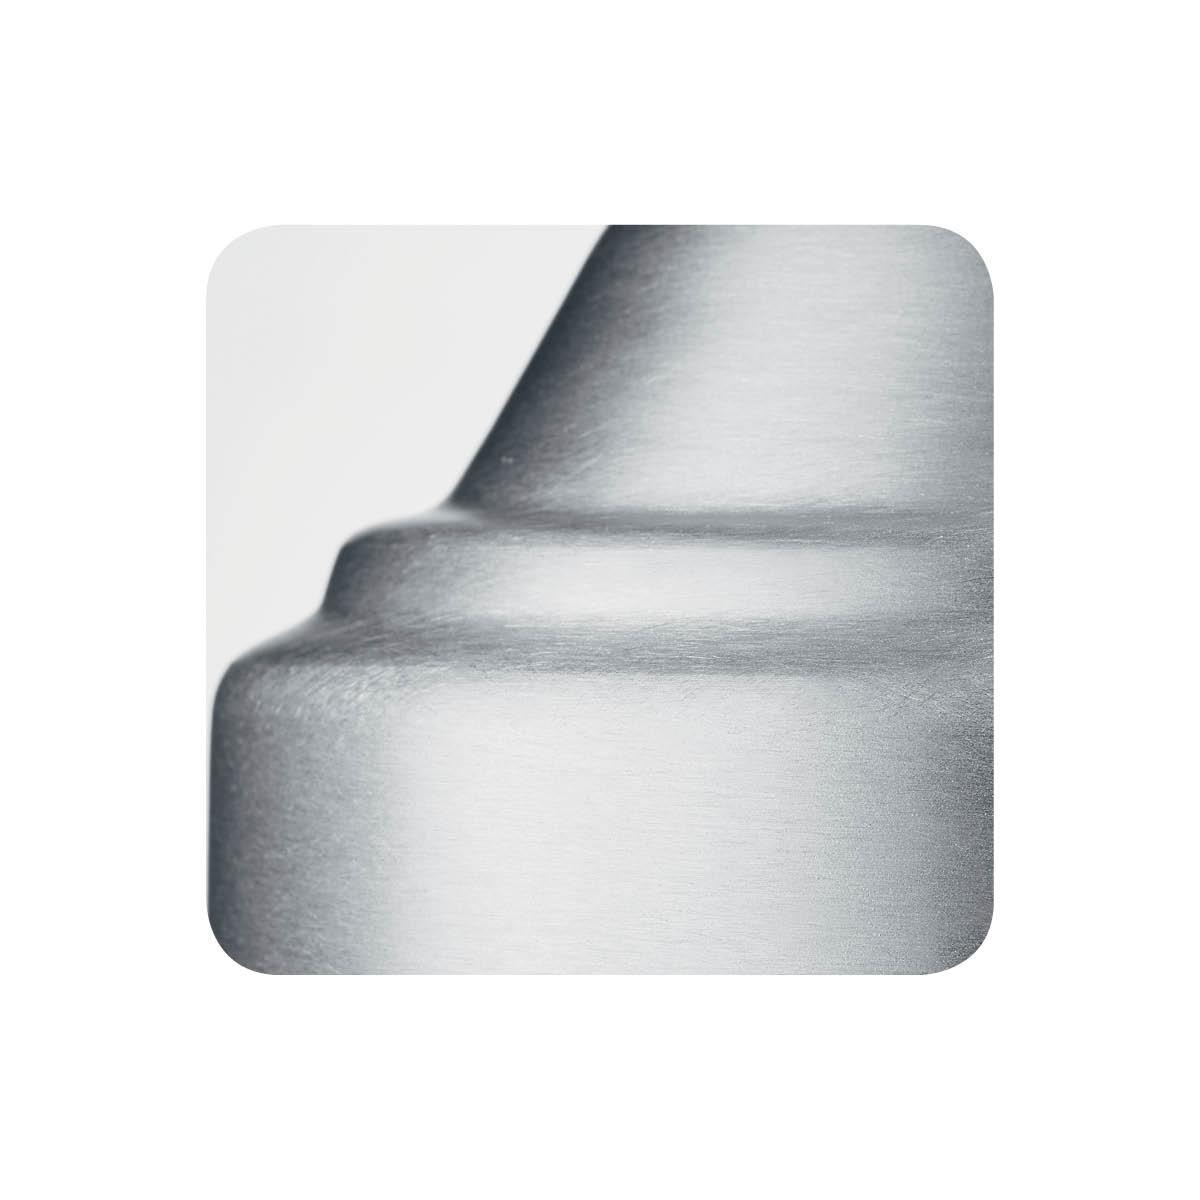 Brushed chrome alternative metal finish sample